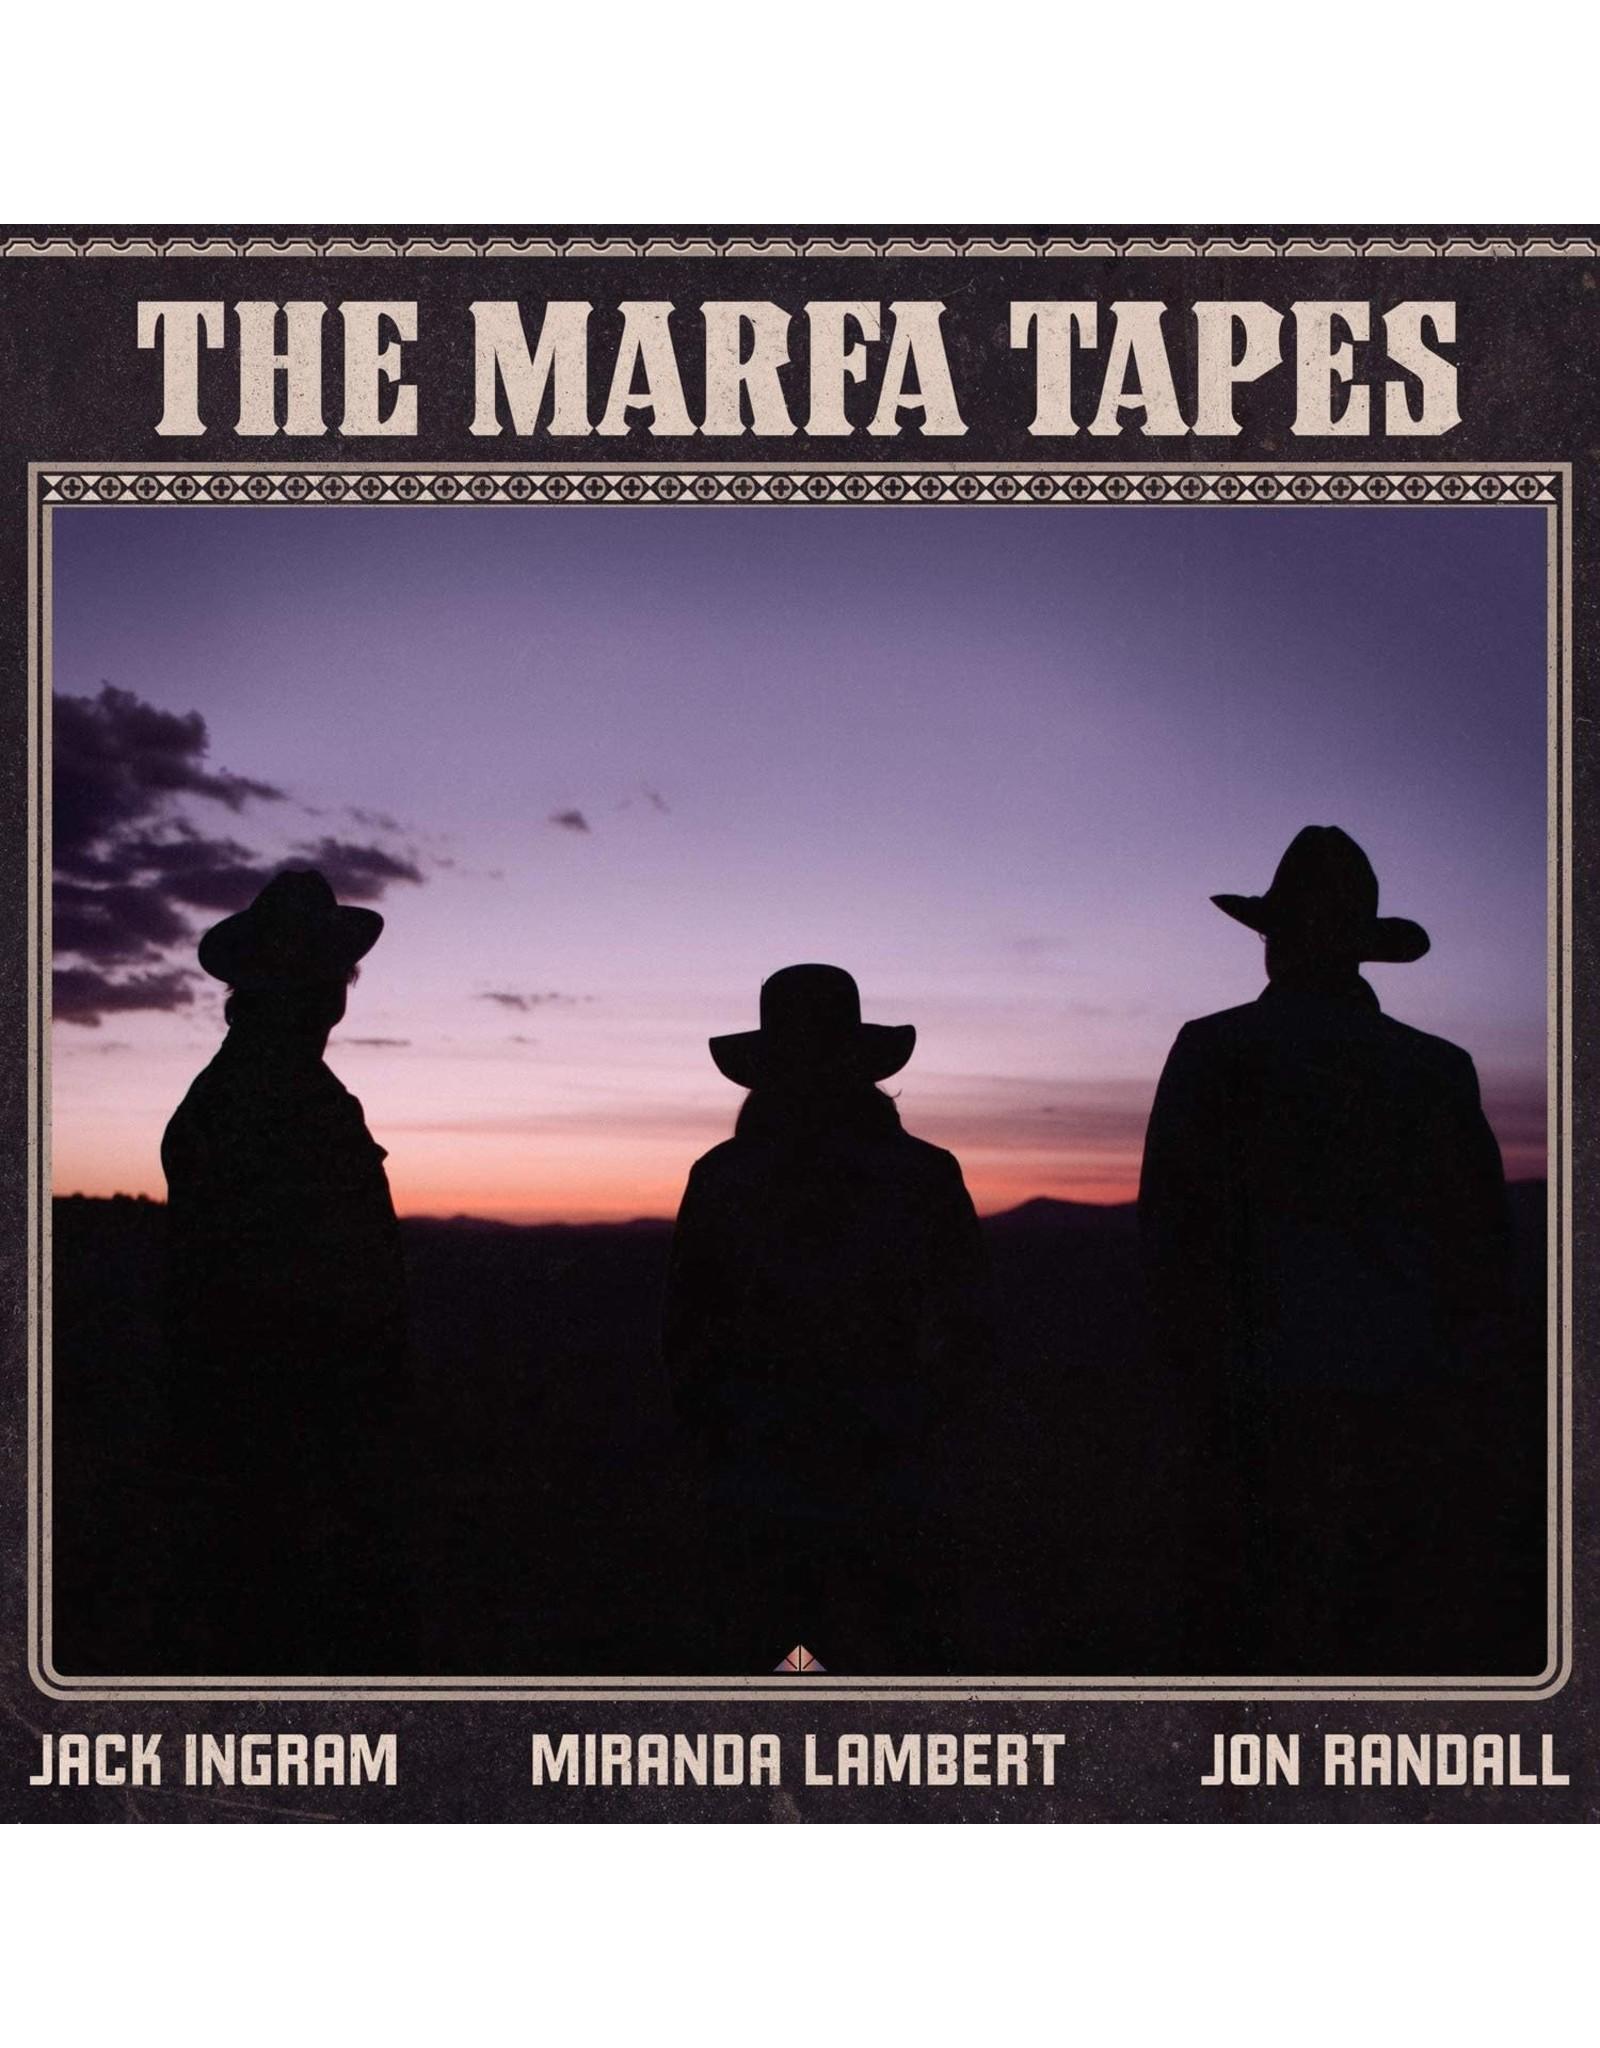 Jack Ingram / Miranda Lambert / Jon Randall - The Marfa Tapes